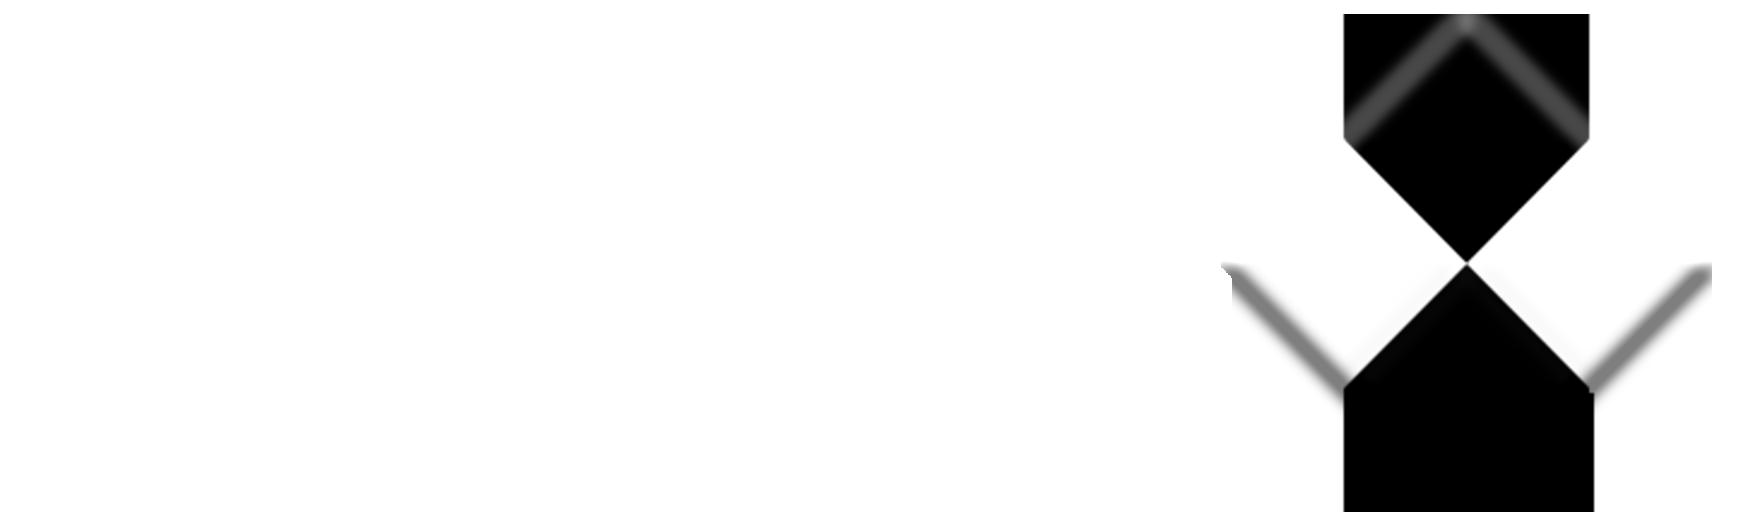 Chess Materials